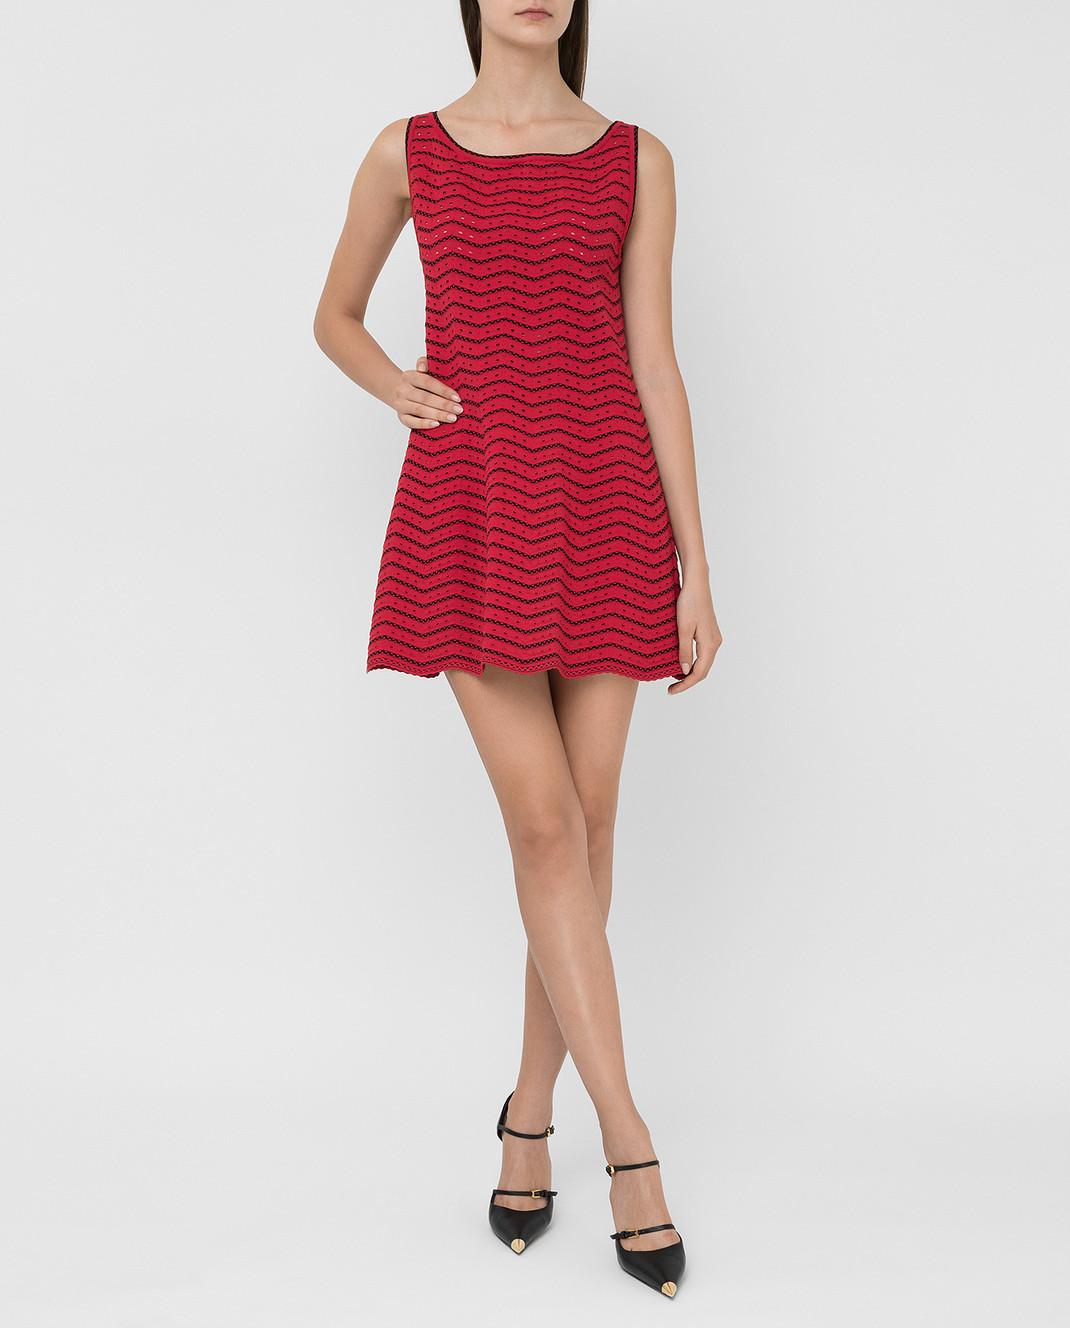 Azzedine Alaia Красное платье 6E9UC86RM224 изображение 2